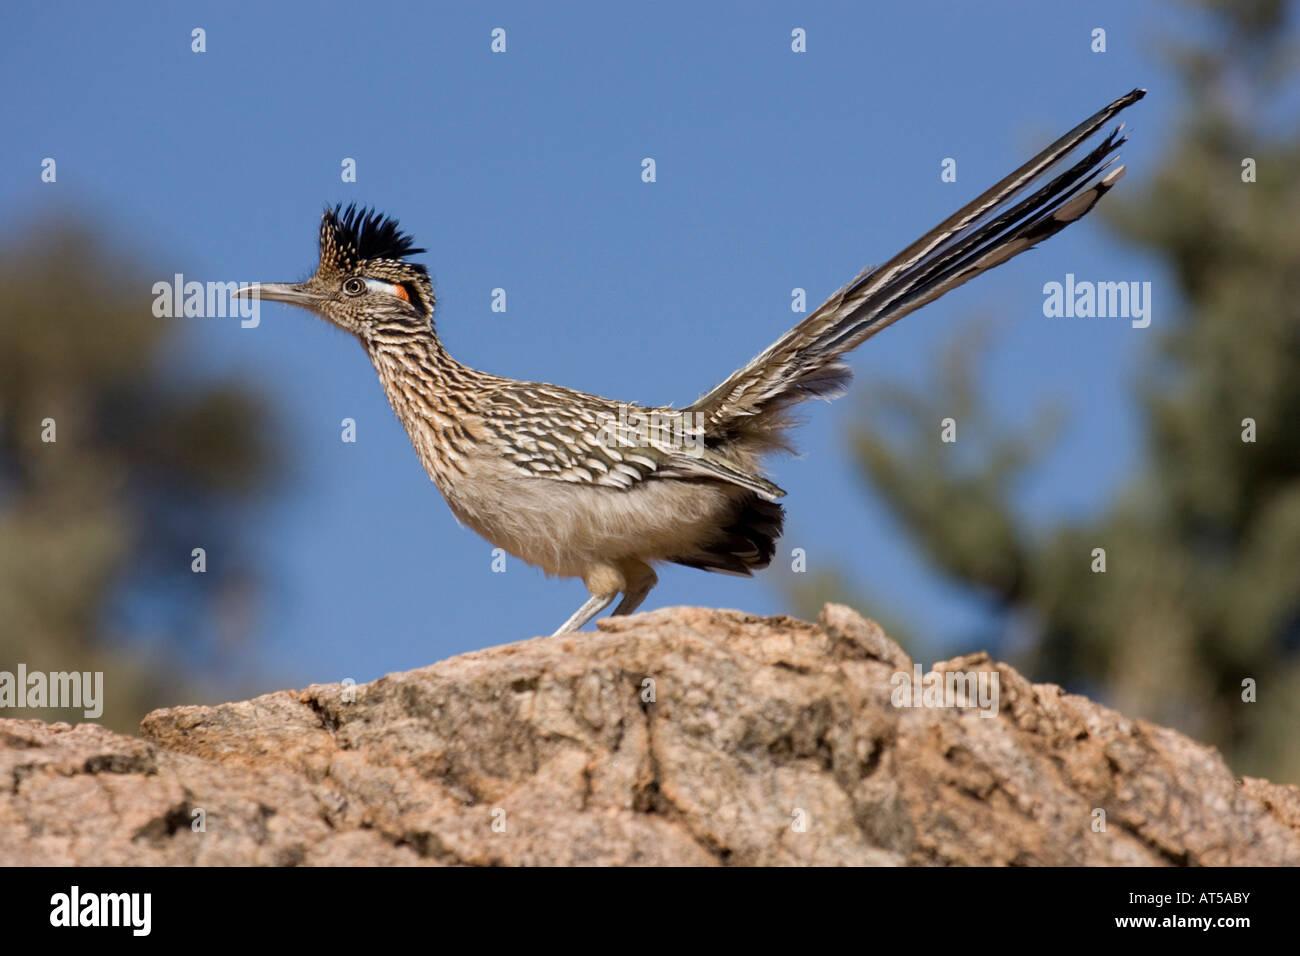 Greater Roadrunner, Geococcyx californianus. - Stock Image